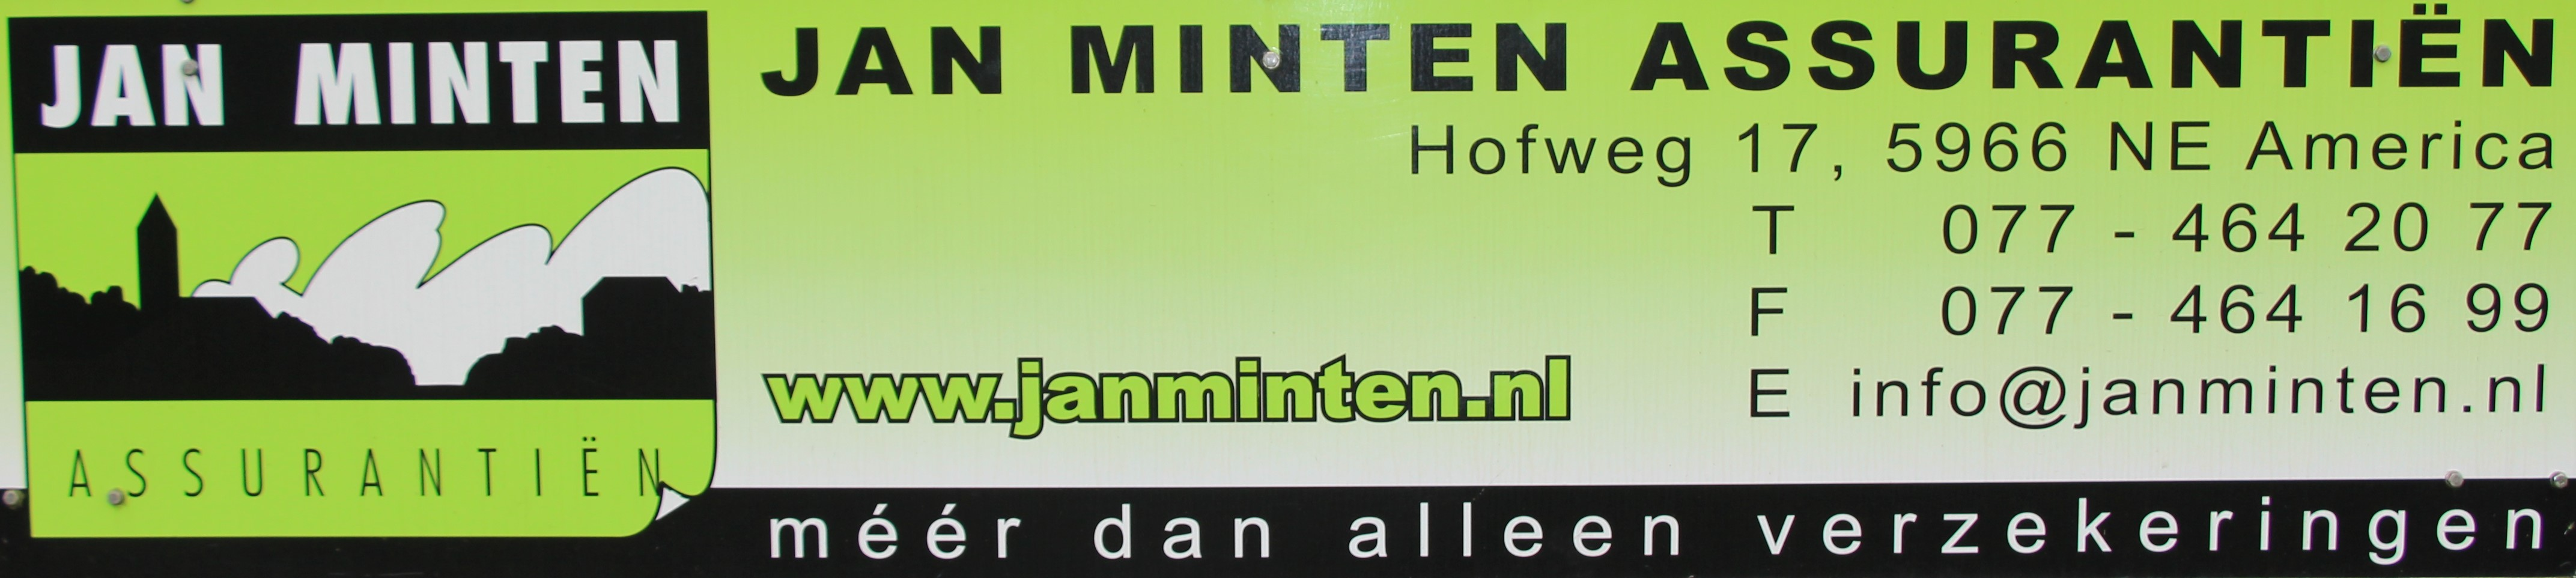 bord_JanMinten